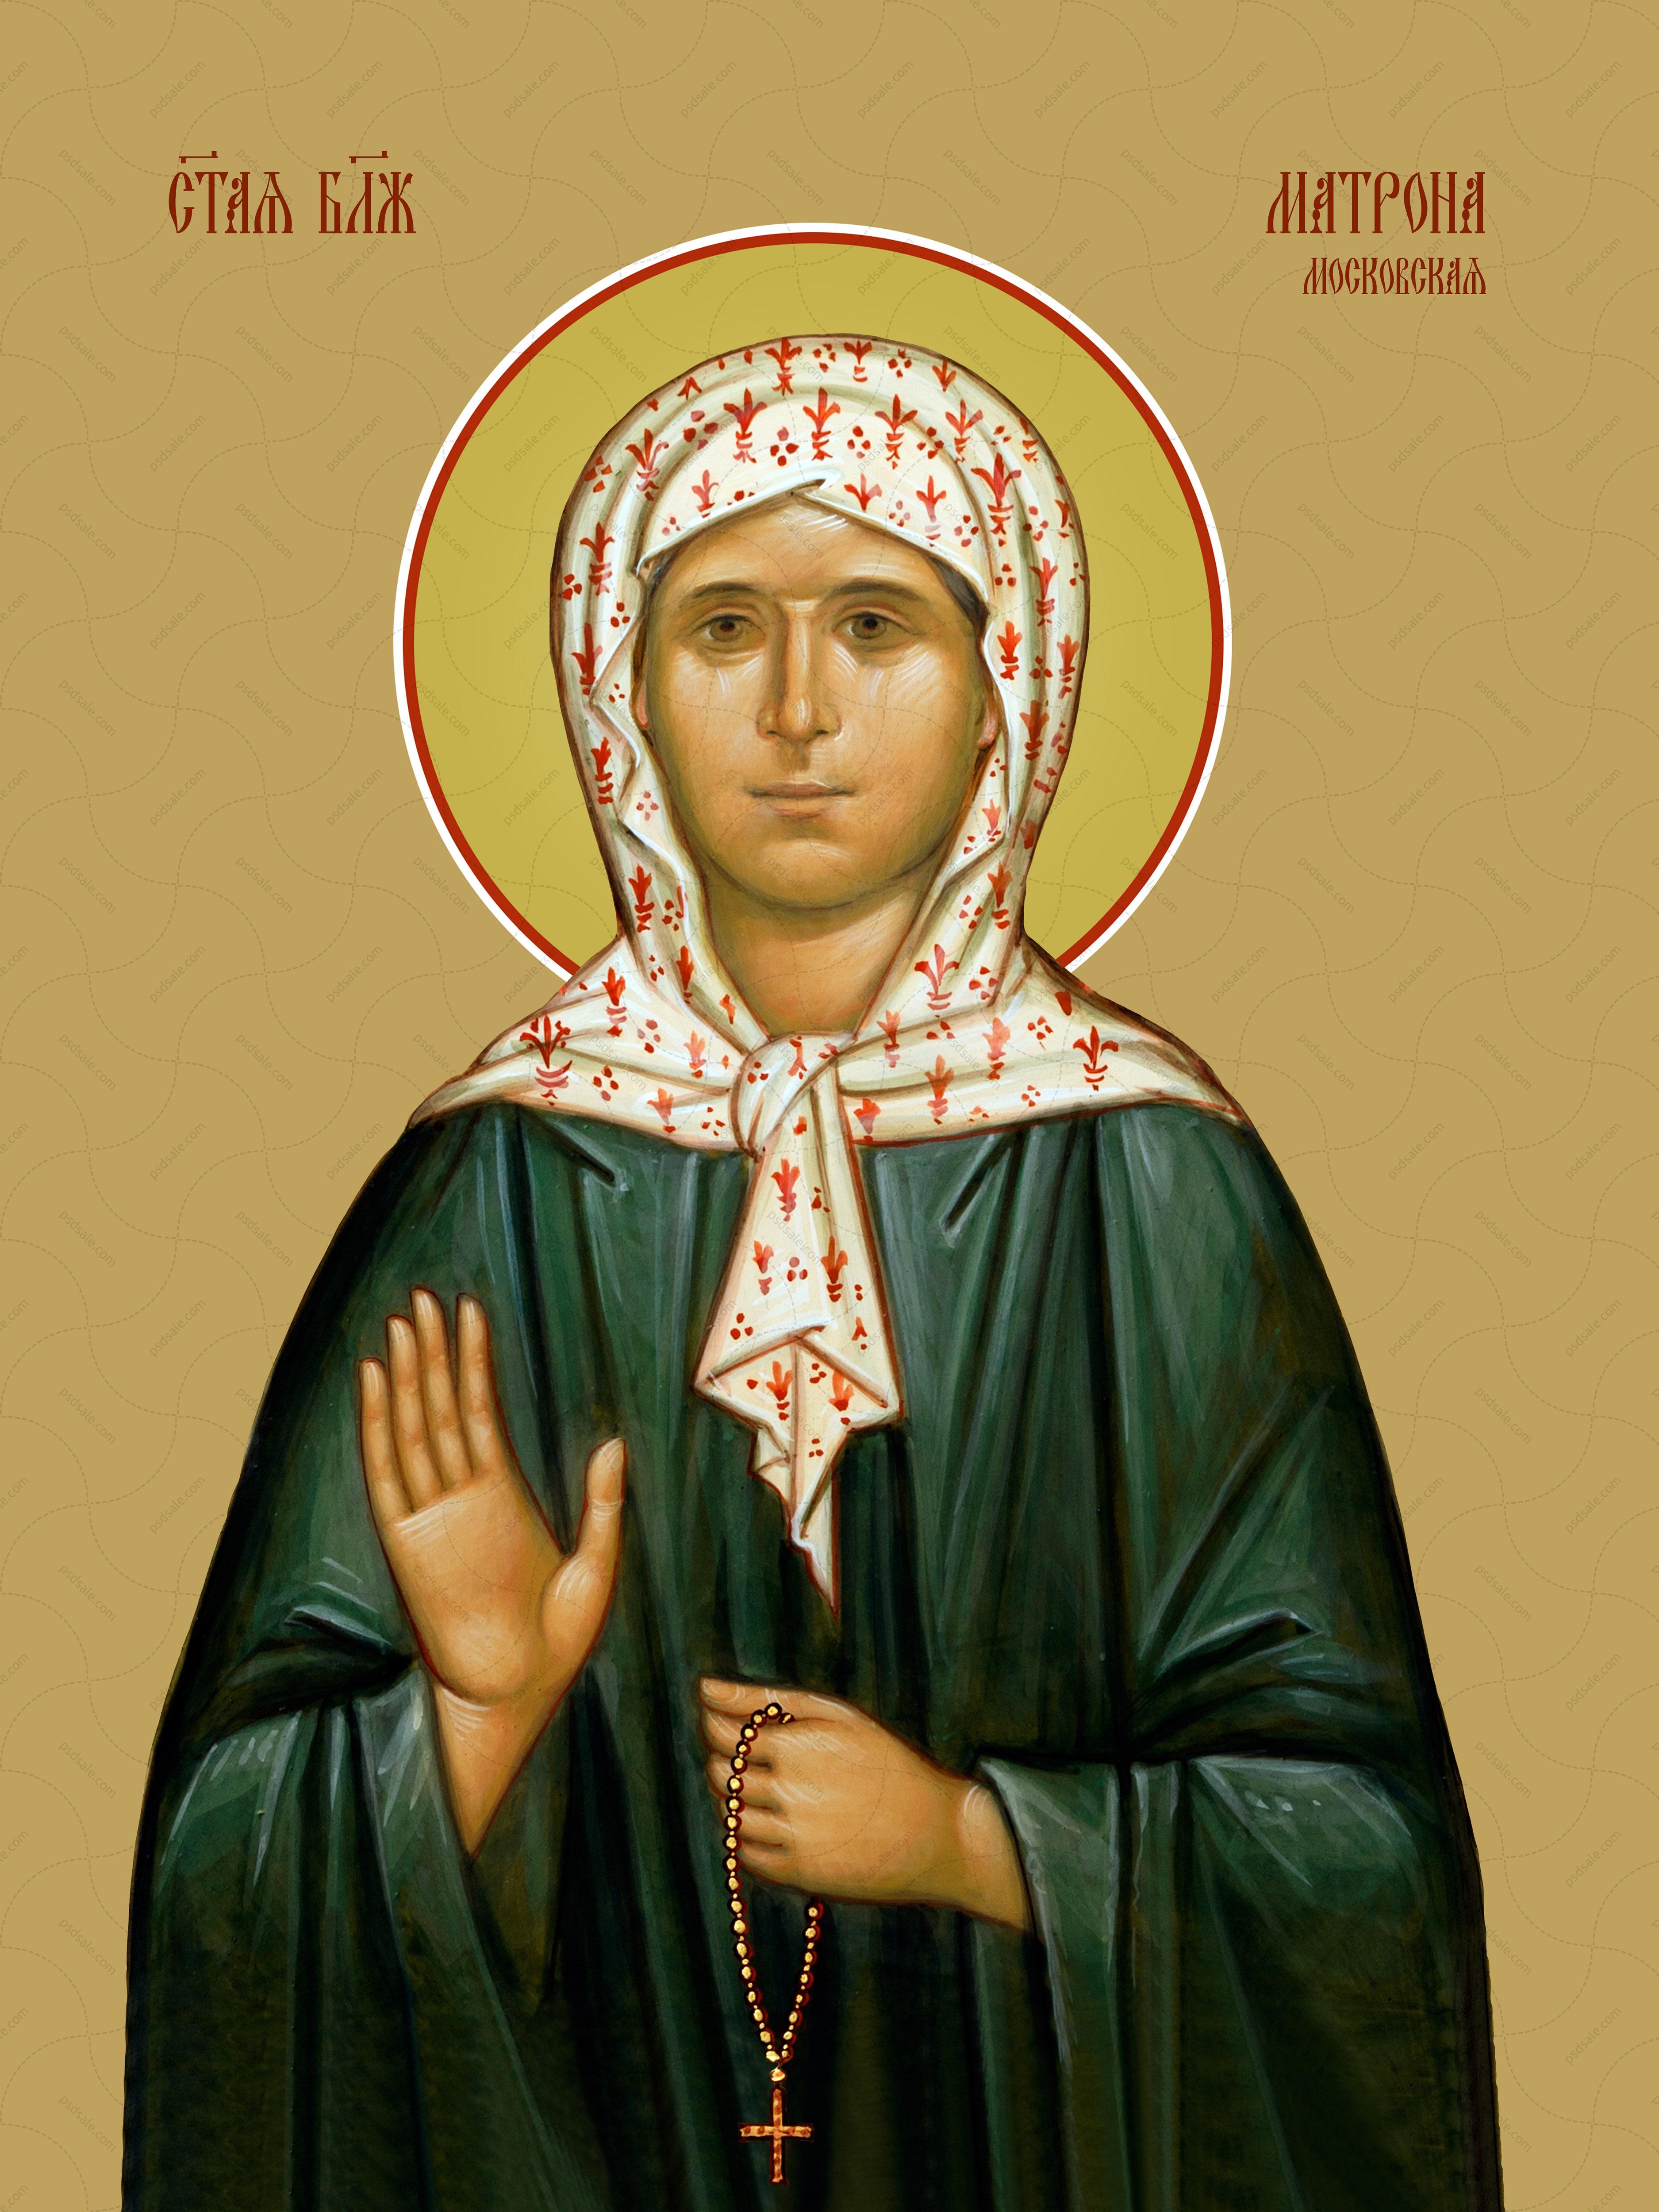 Матрона Московская, святая блаженная